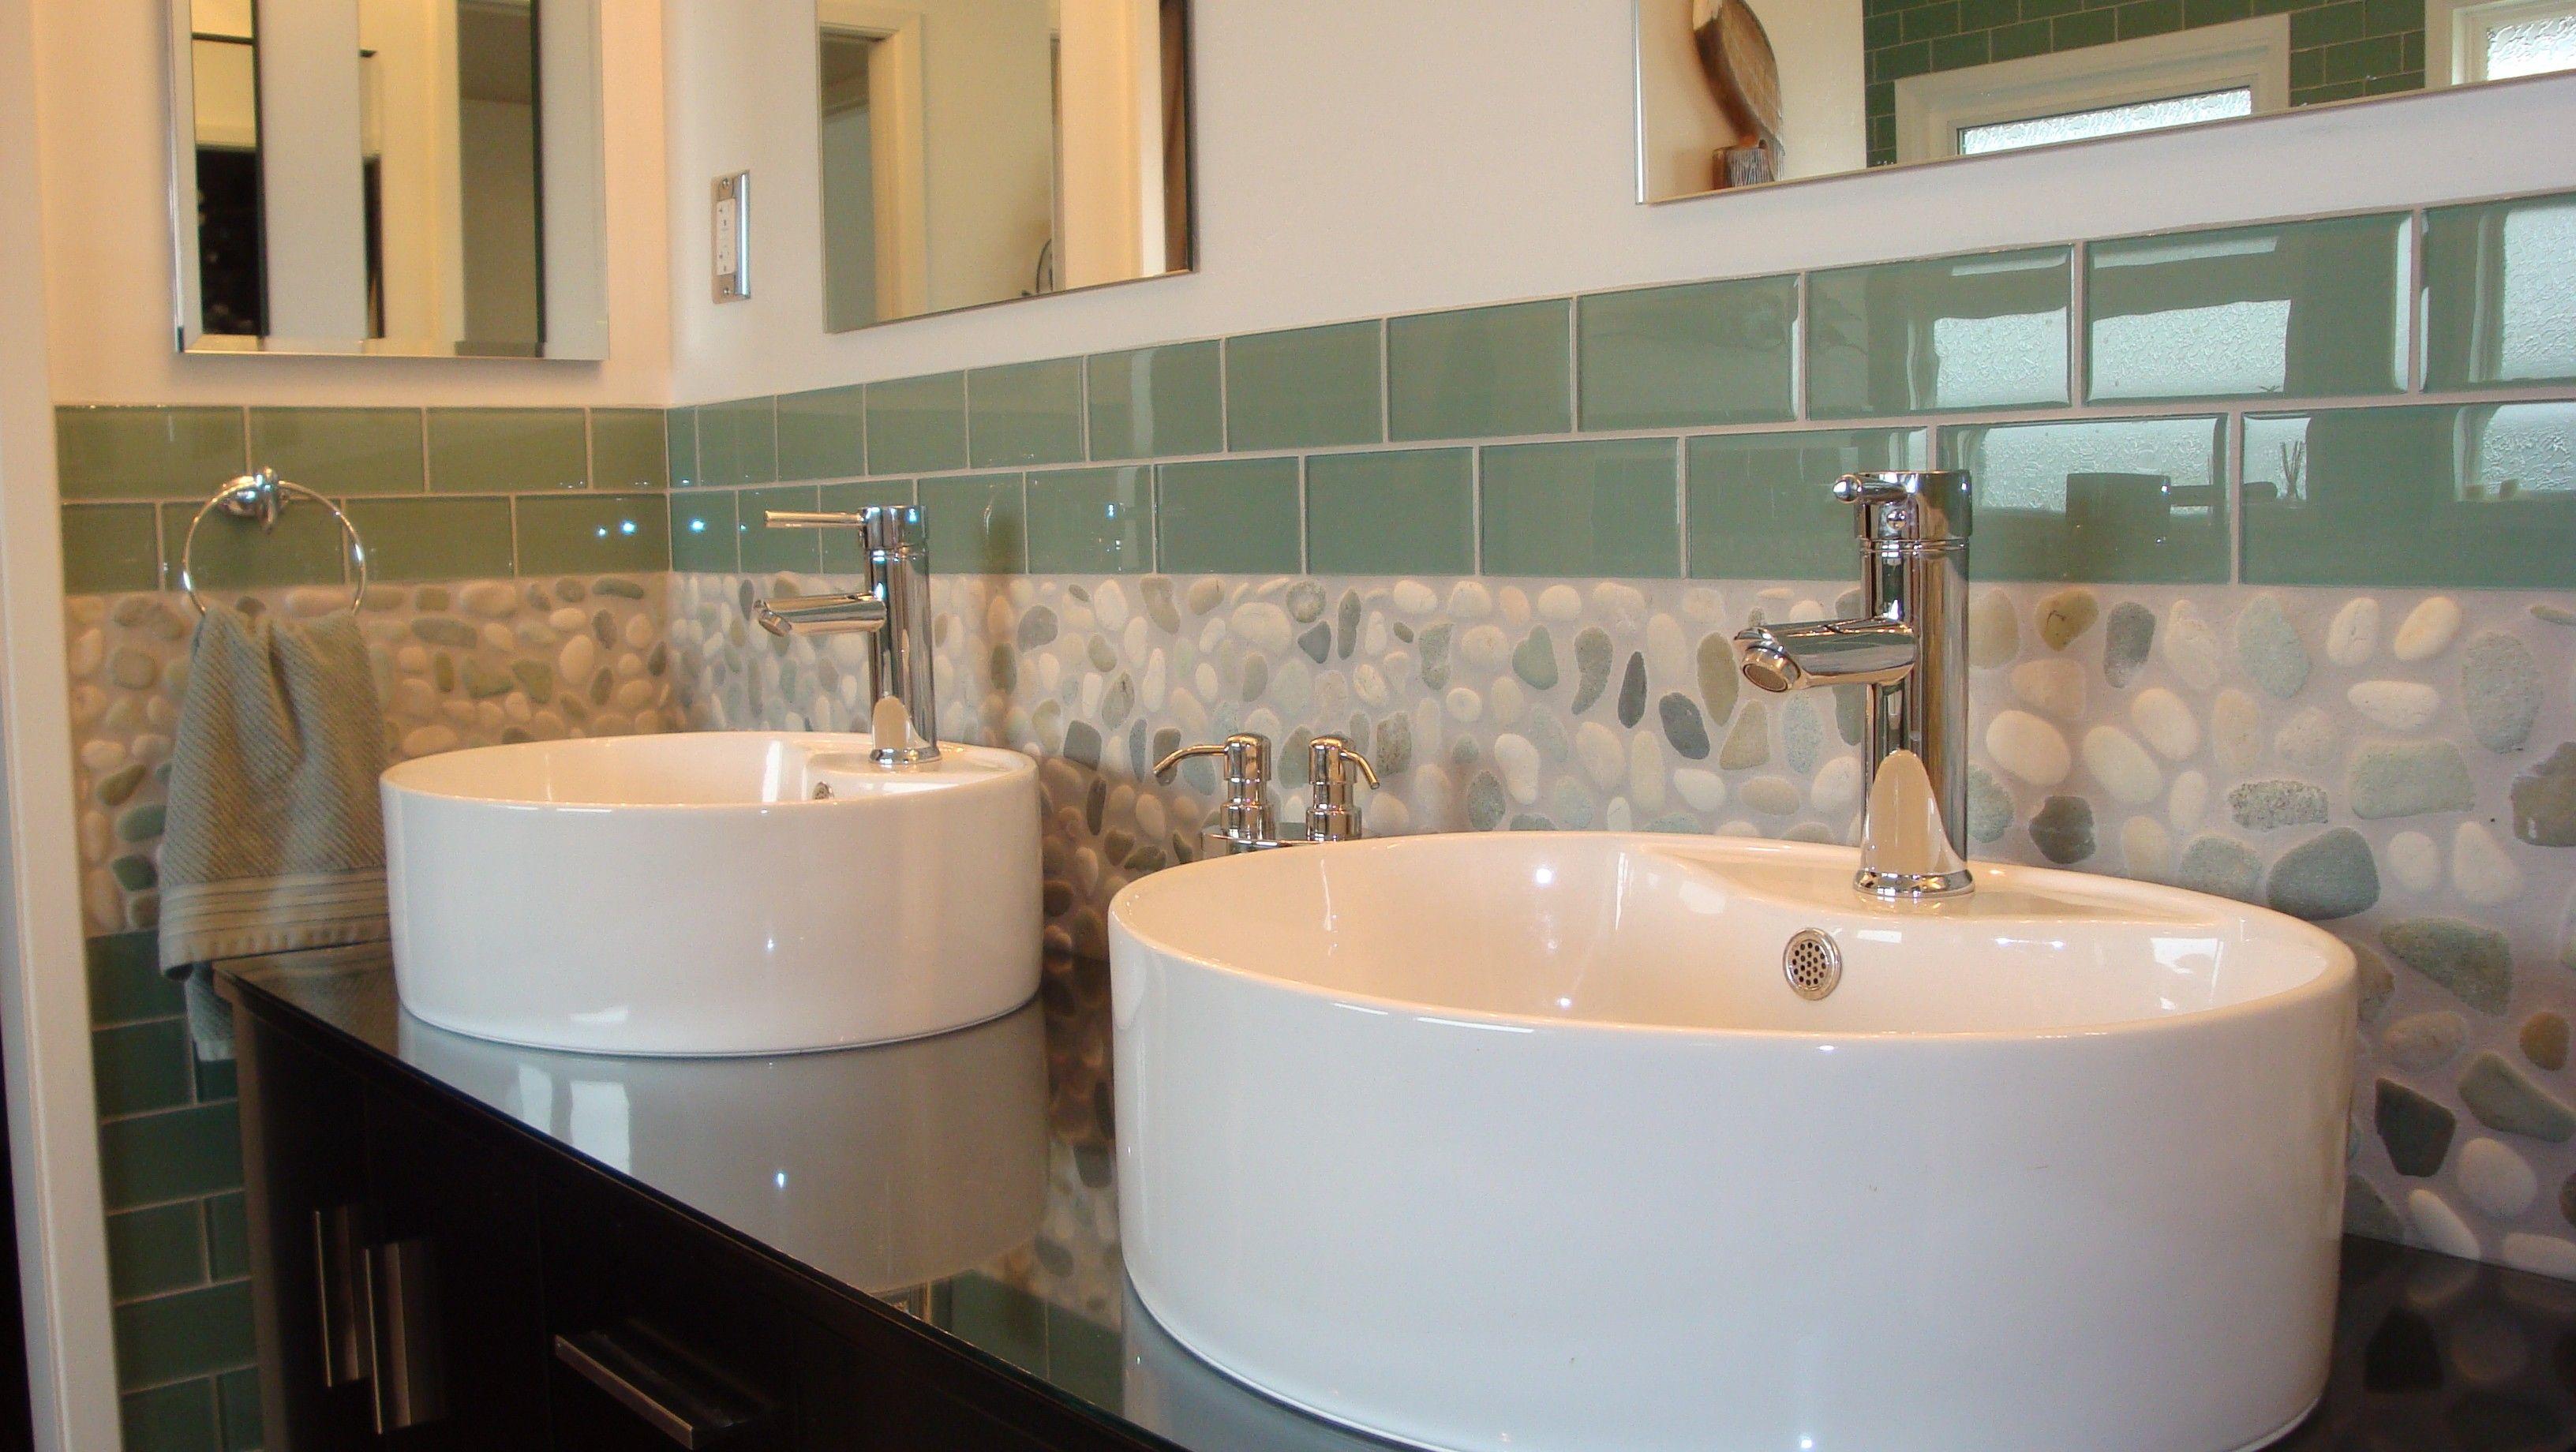 Aquant India Has Various Kinds Designer Wash Basin, Ceramic Art Basins,  Stone Pedestal Wash